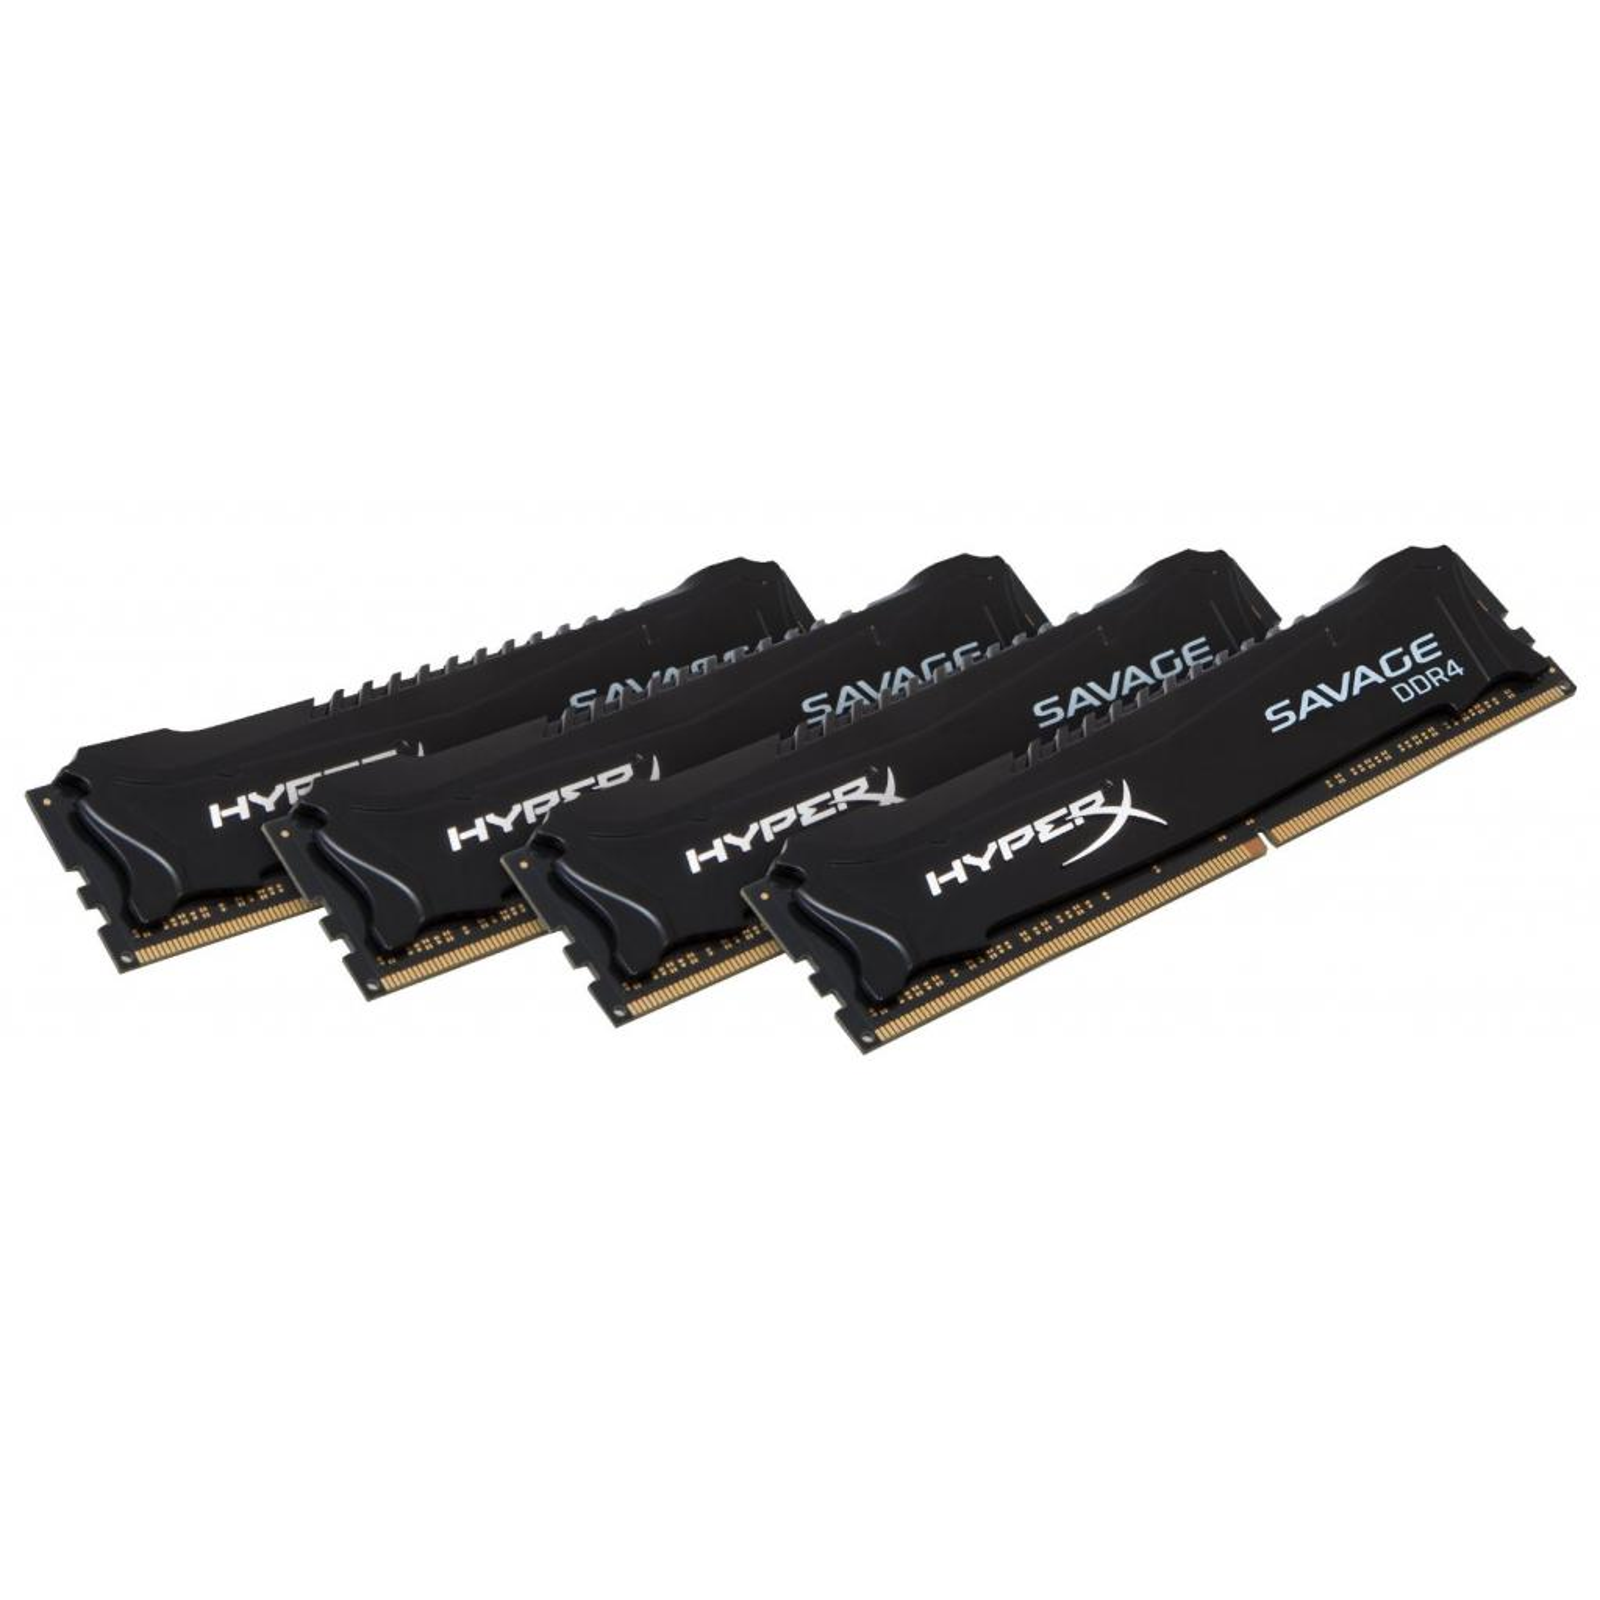 Модуль памяти для компьютера DDR4 32GB (4x8GB) 2666 MHz HyperX Savage Kingston (HX426C13SBK4/32) изображение 2